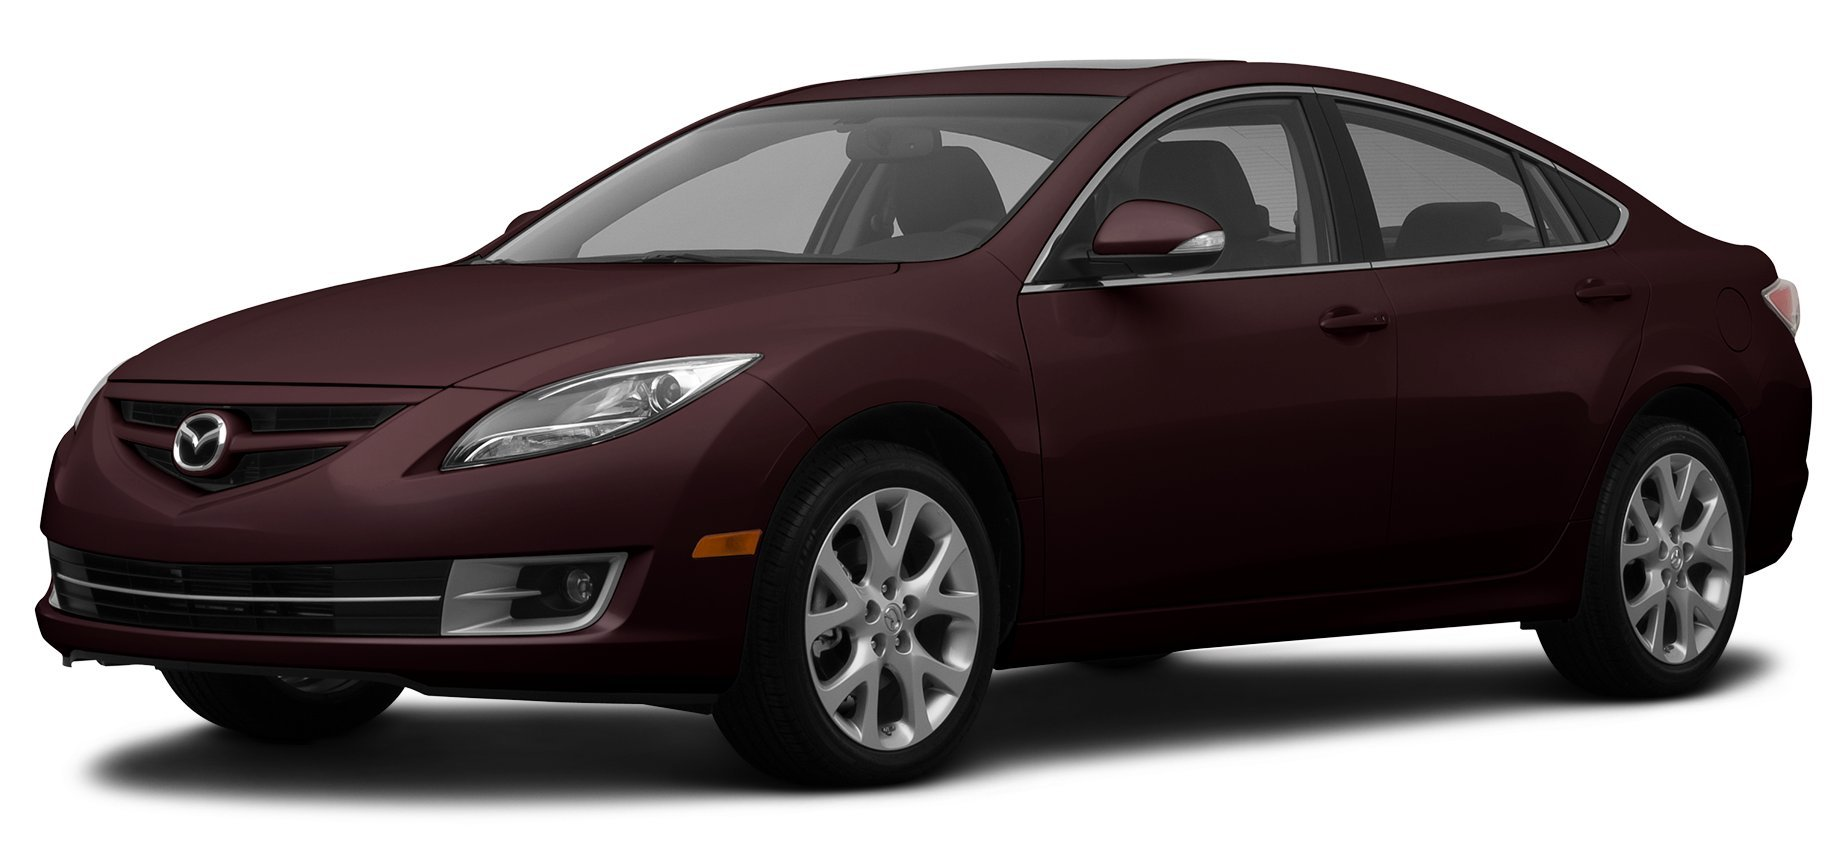 2012 Mazda 6 I Grand Touring, 4 Door Sedan Automatic Transmission ...